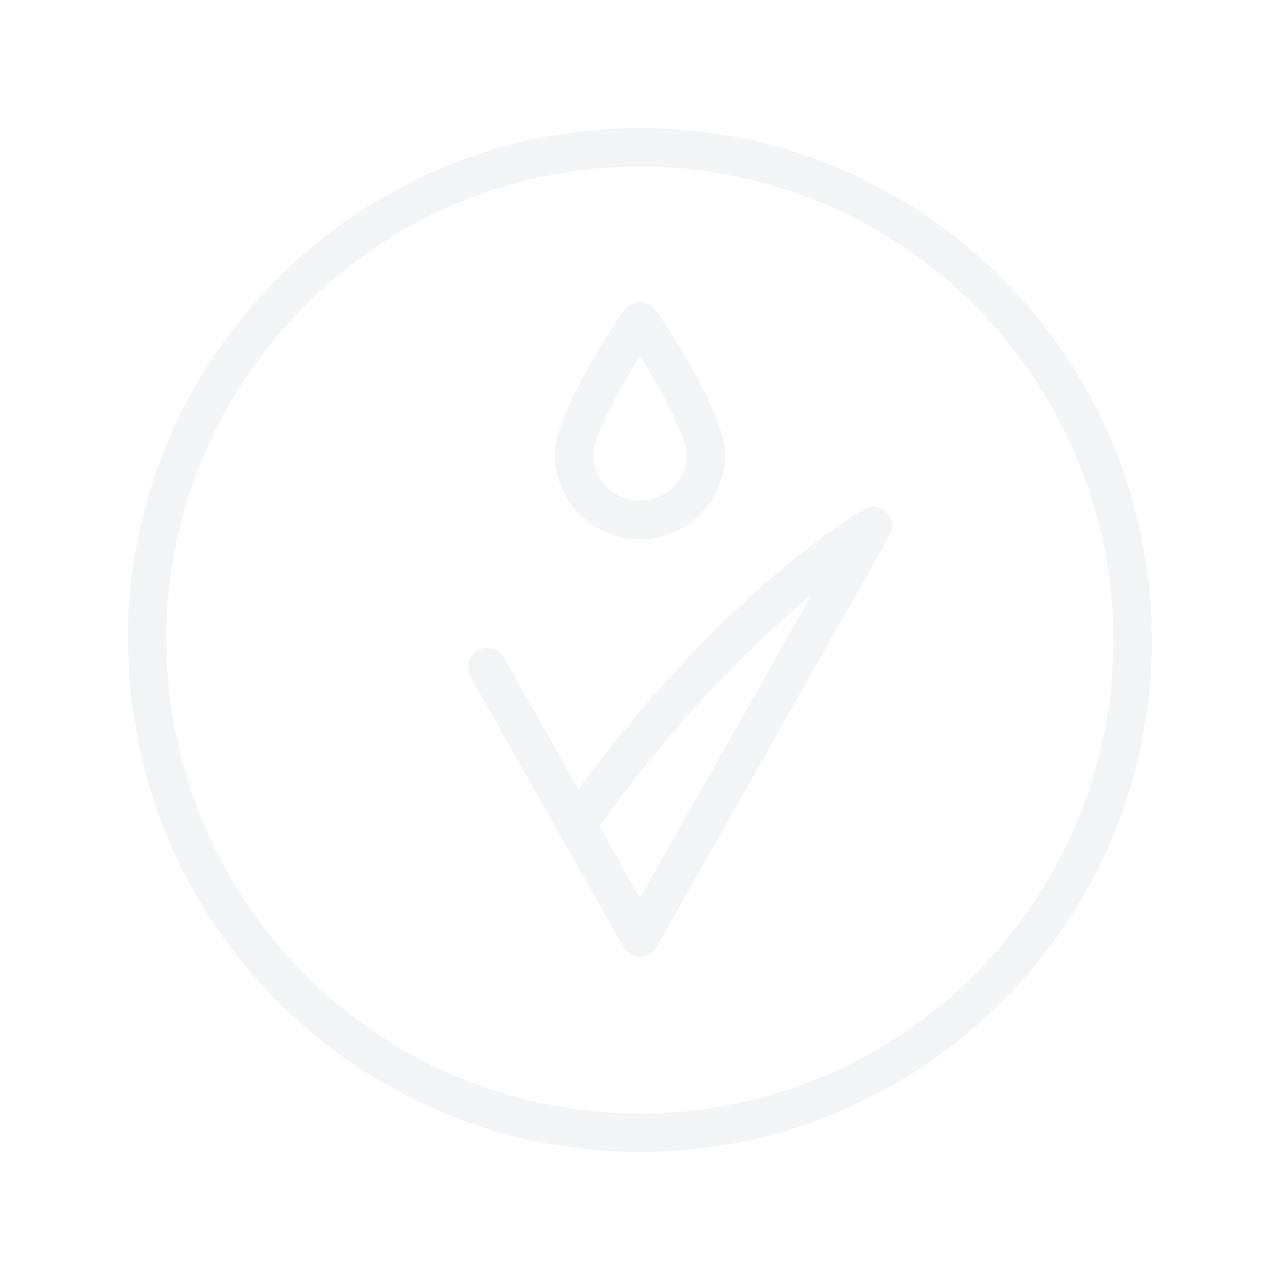 Shiseido Extra Gentle Shampoo for Normal Hair 200ml